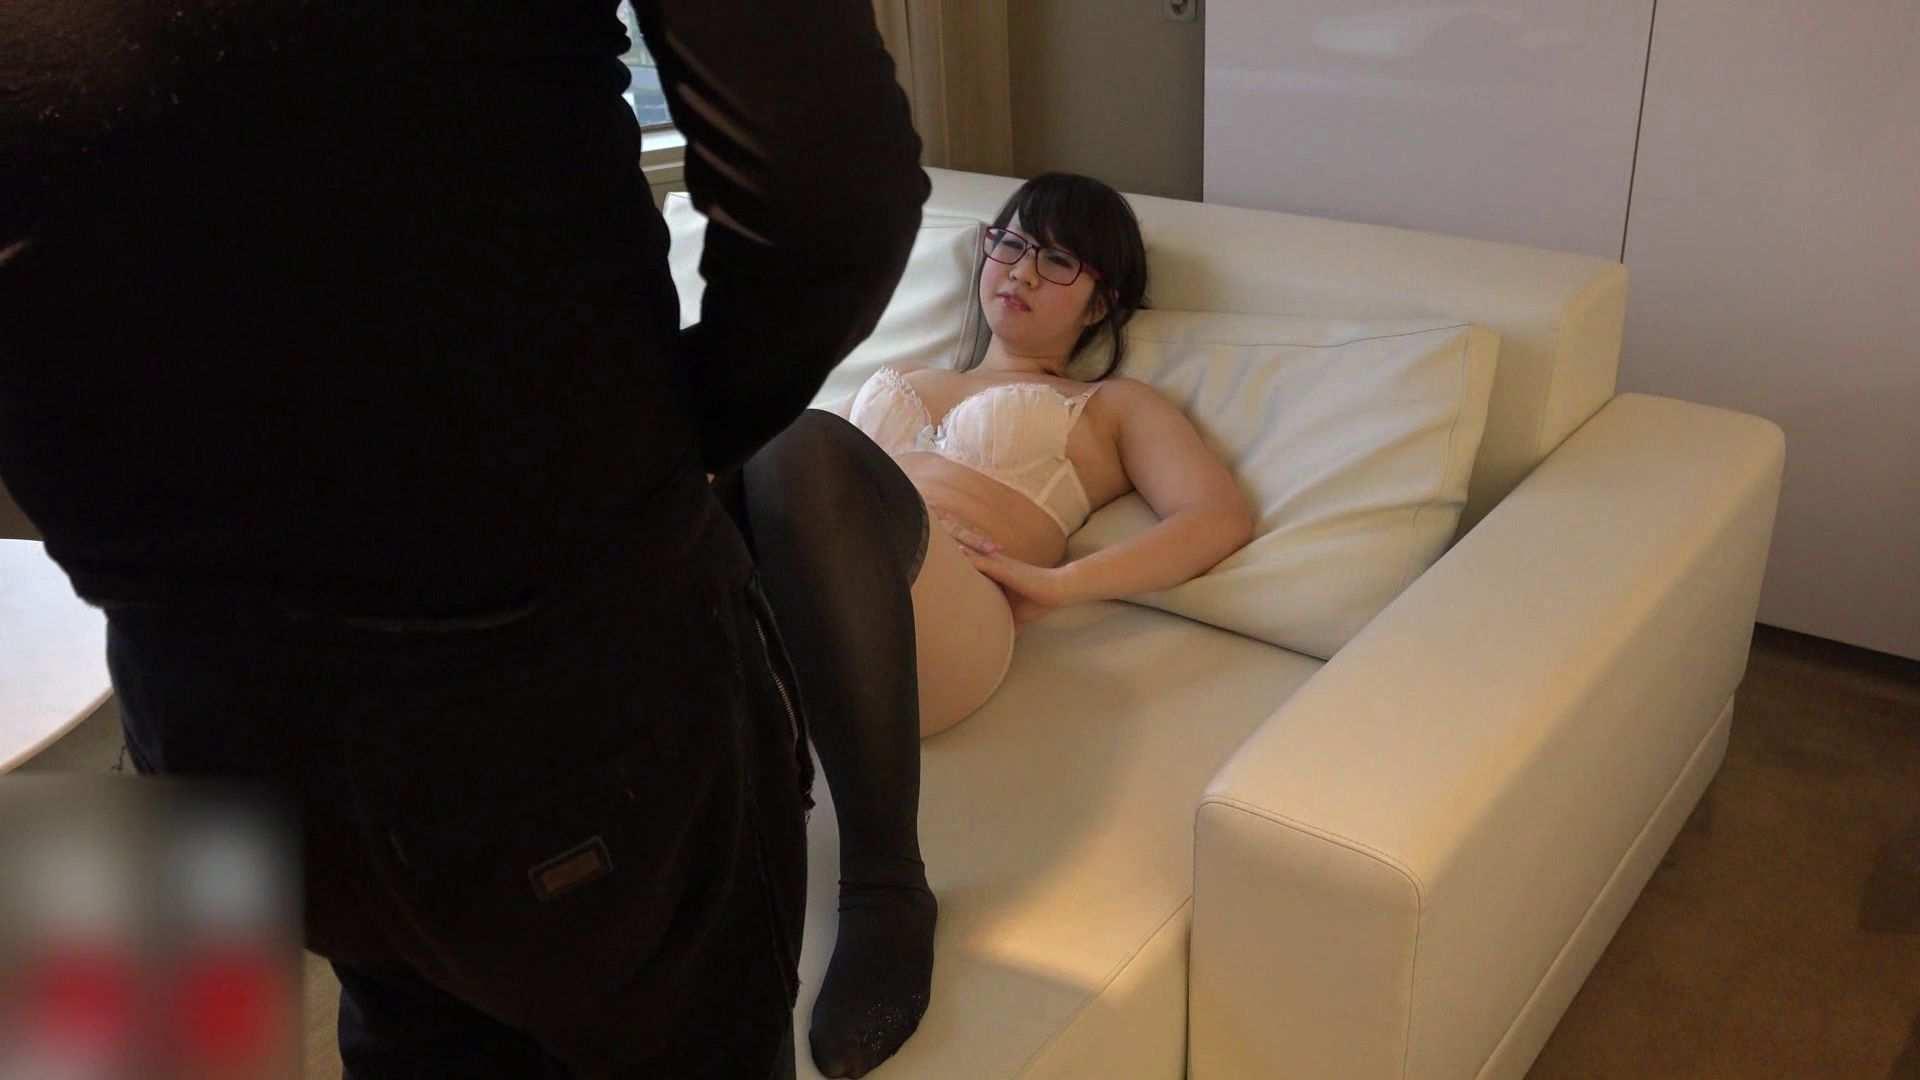 S級厳選美女ビッチガールVol.39 前編 0 | 0  112画像 79